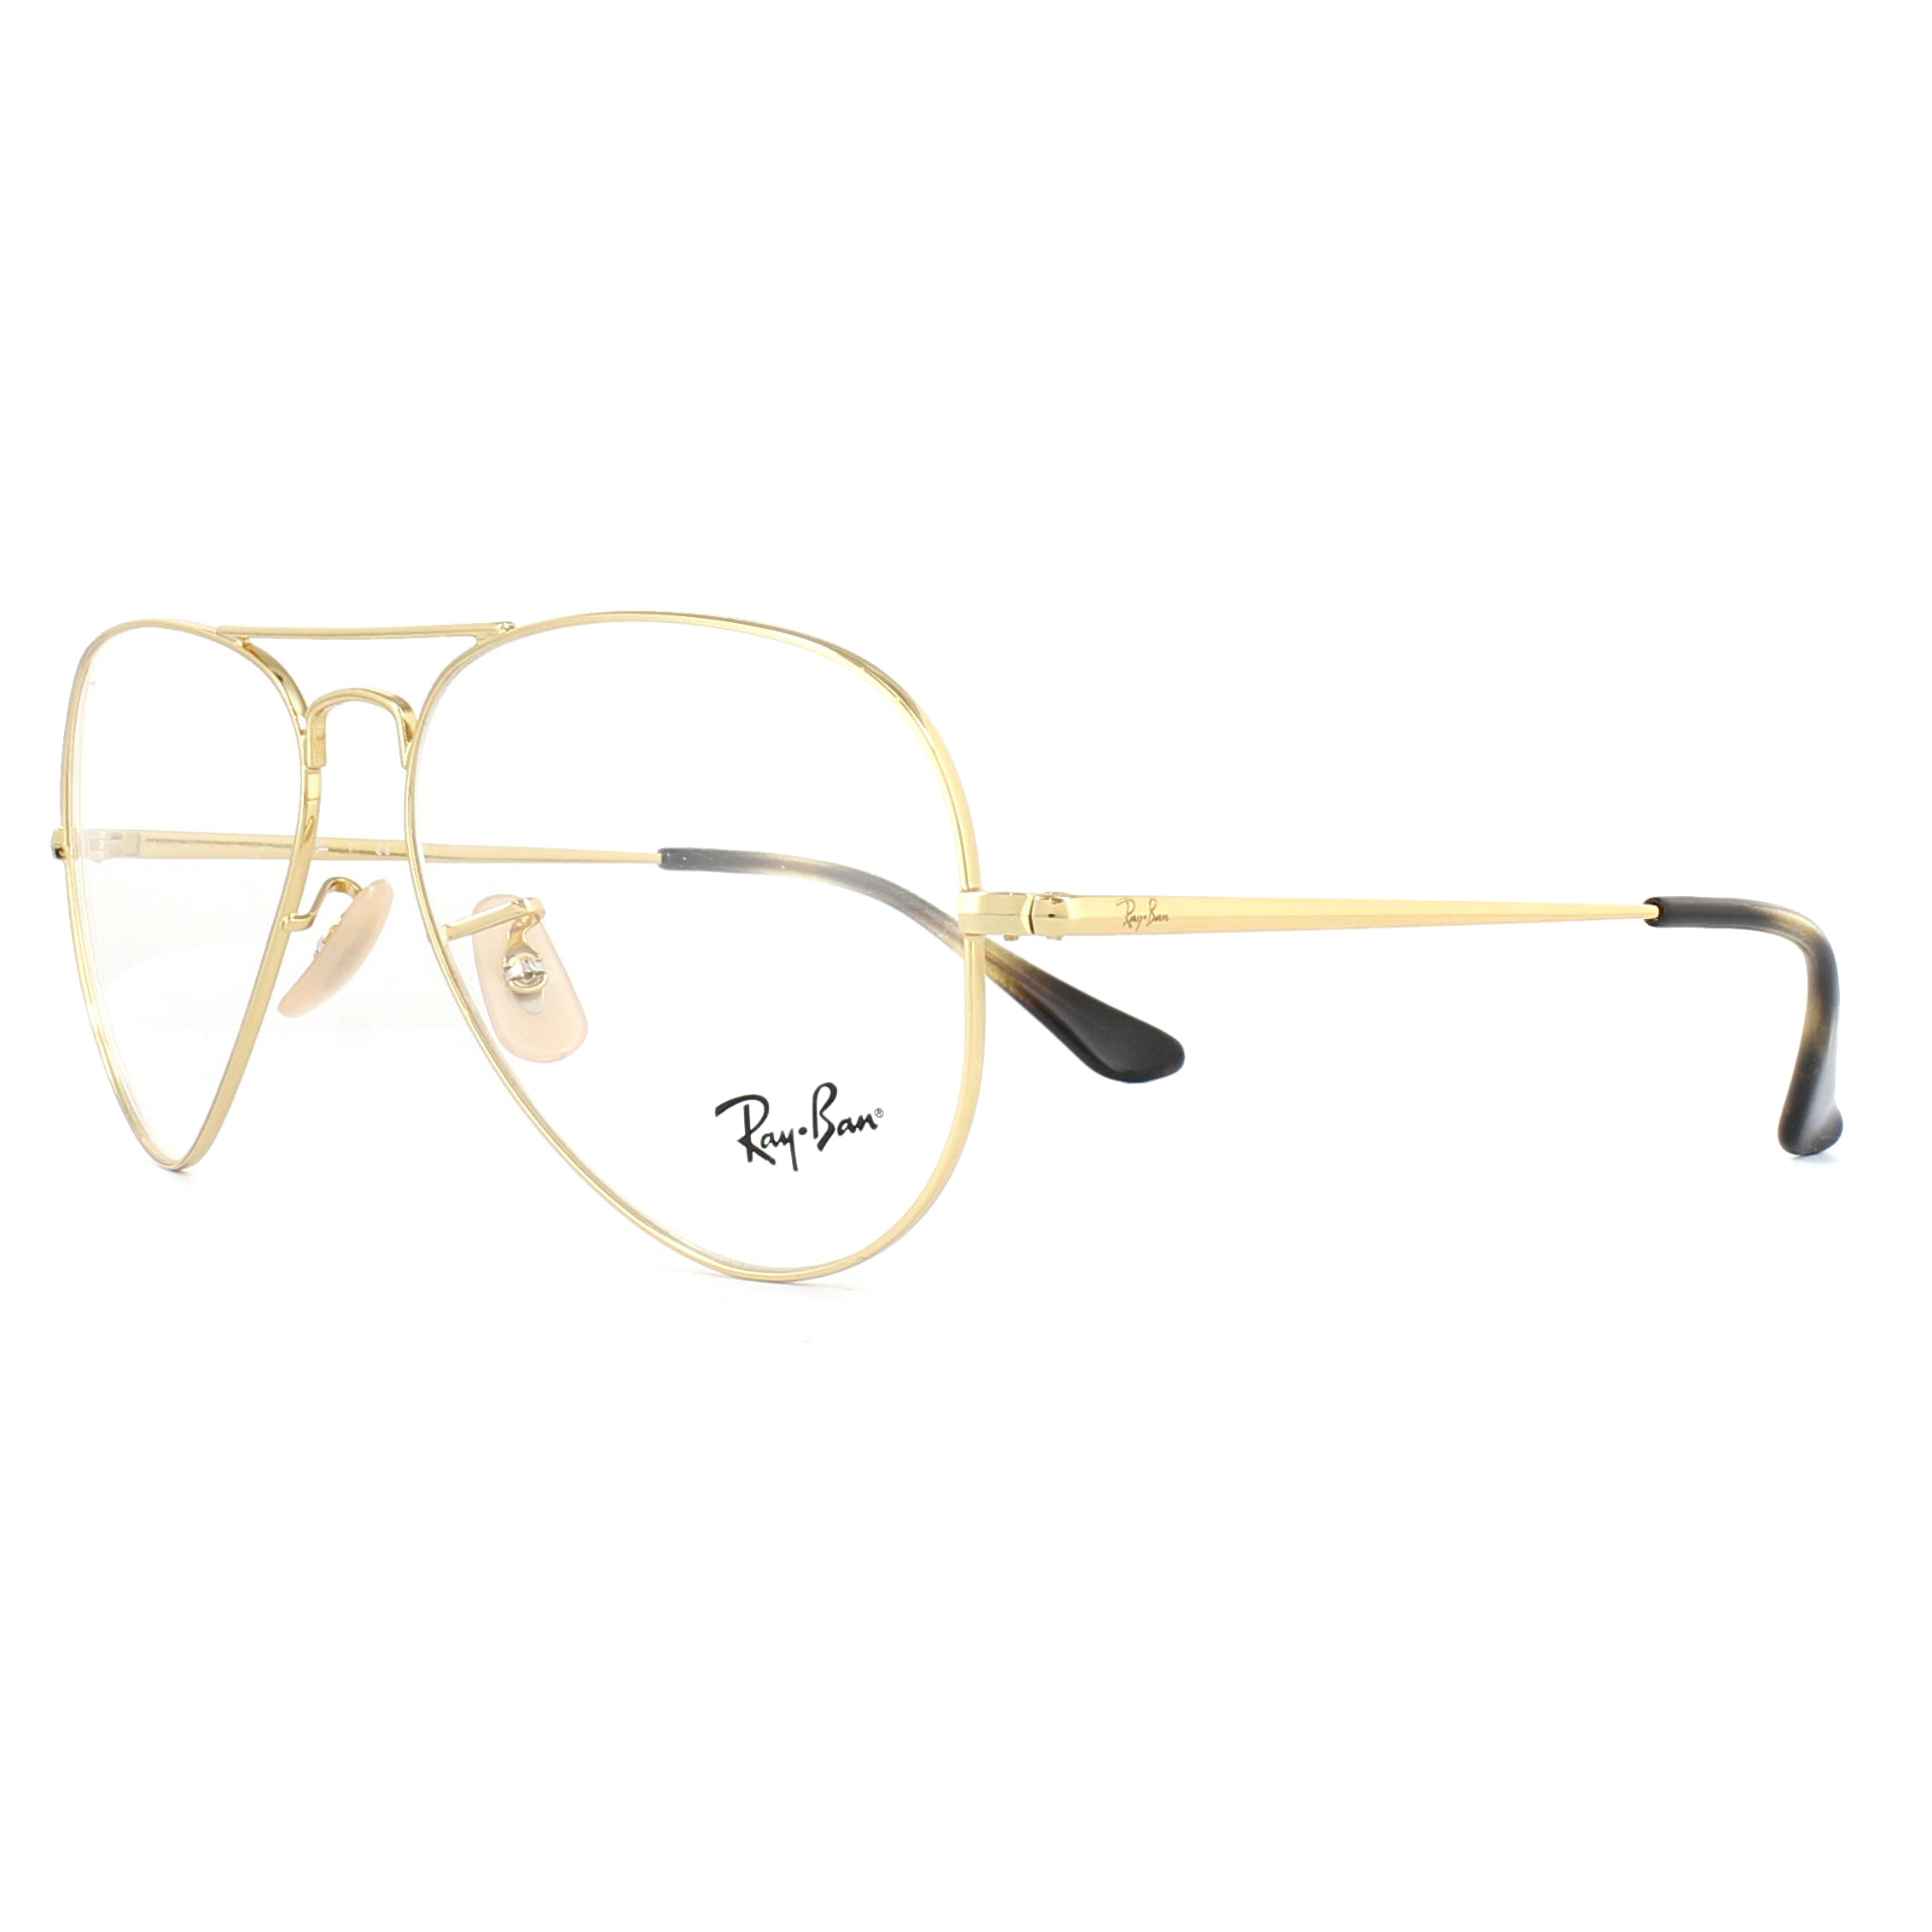 Ray-Ban Glasses Frames 6489 Aviator 2500 Gold 55mm 8053672741841 | eBay